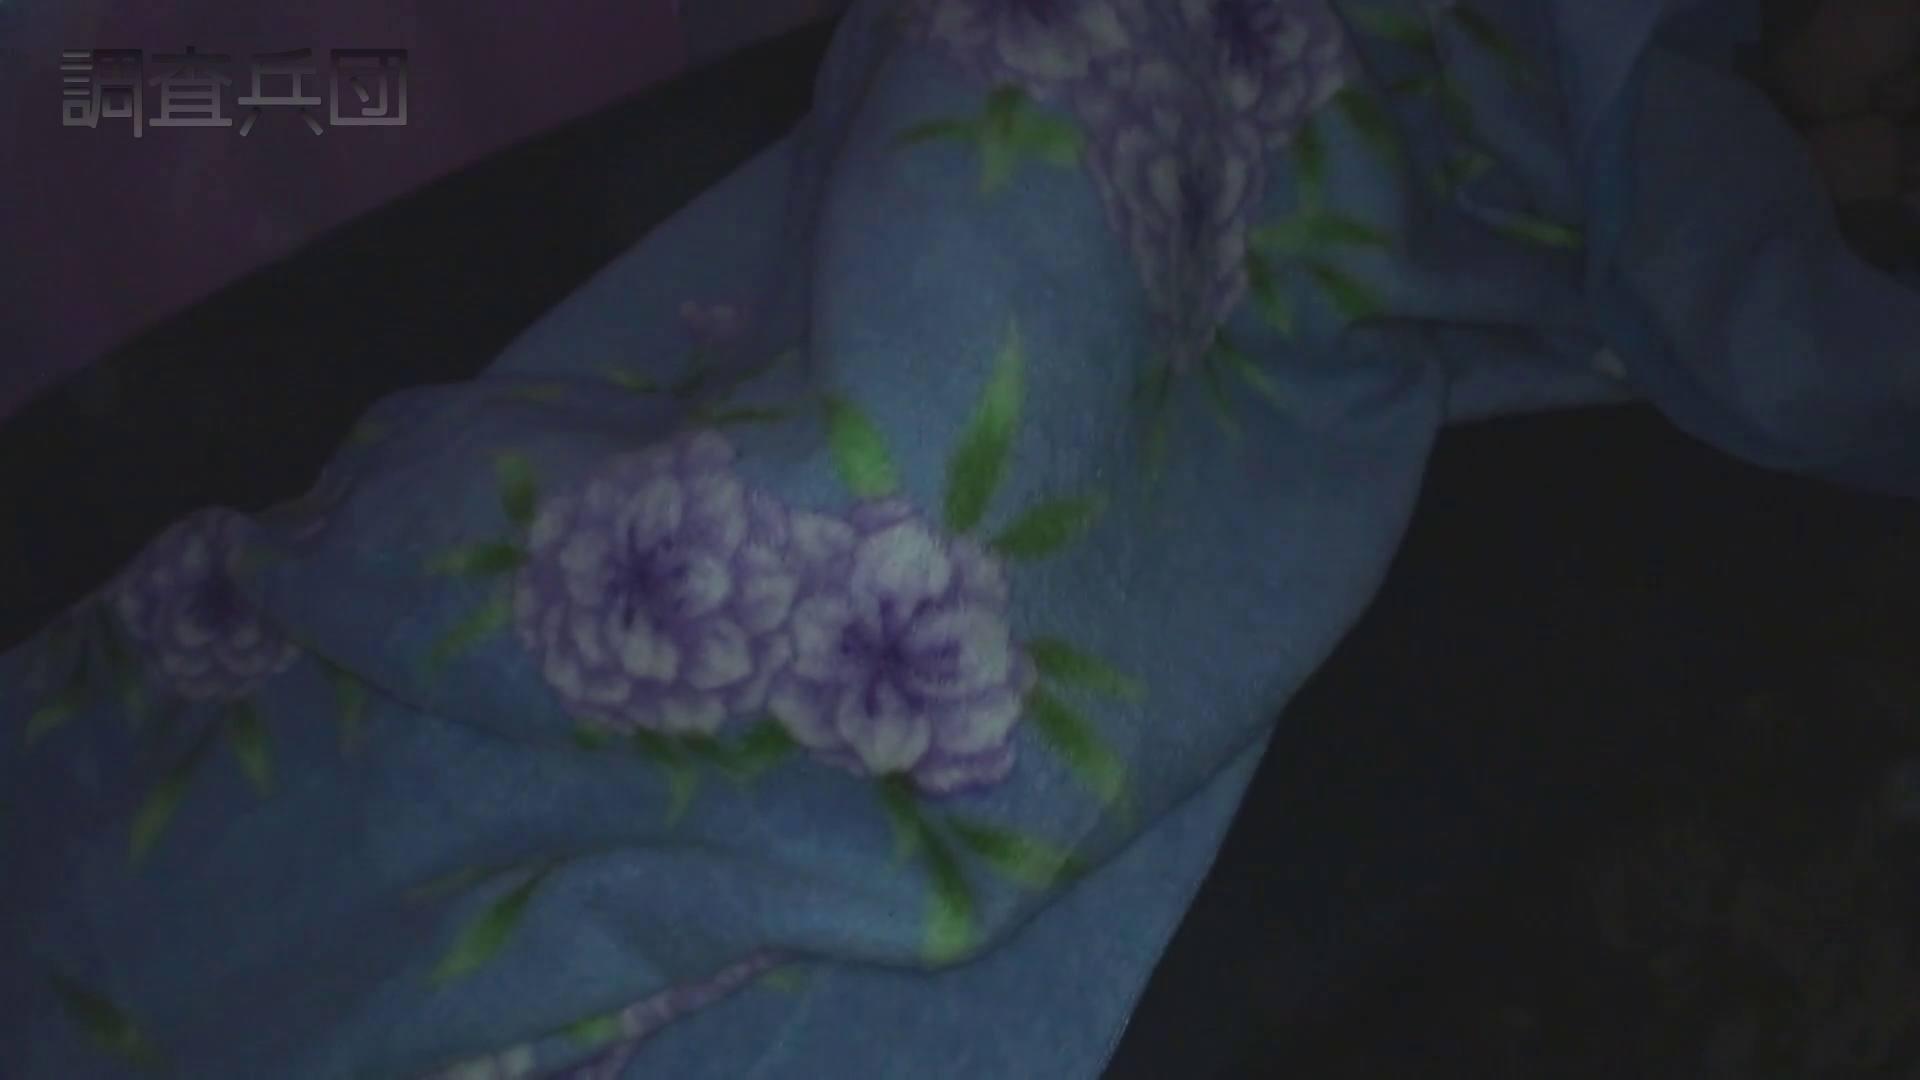 RE:~反撃の悪戯~vol.7 パンケーキ屋バイト・あかり【前編】 盛合せ  78PIX 24